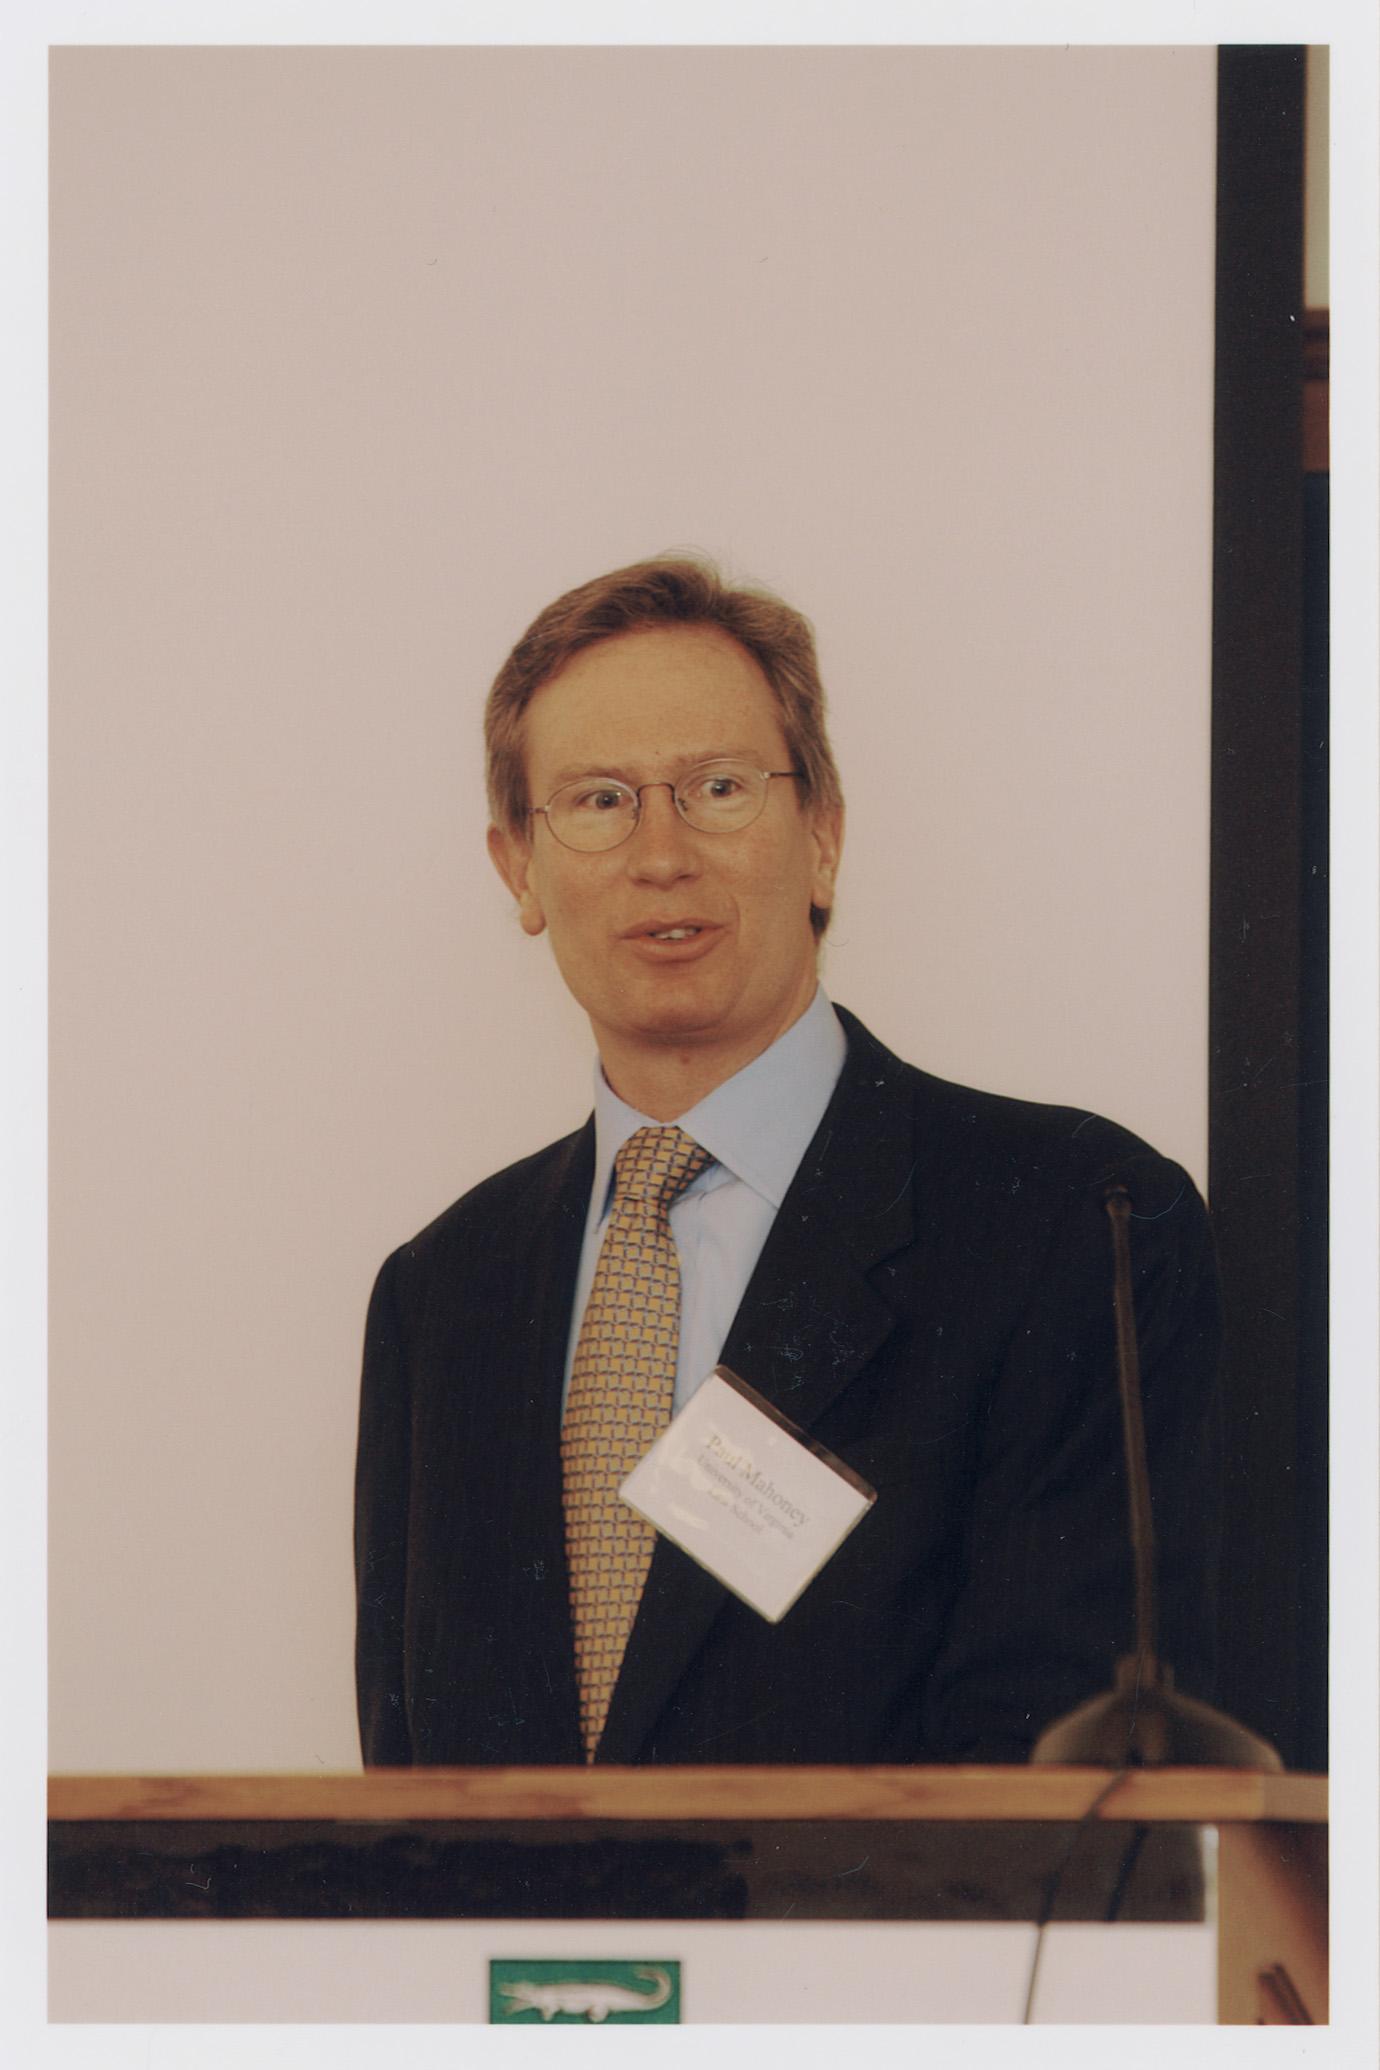 UVA Law Prof. Paul Mahoney '84